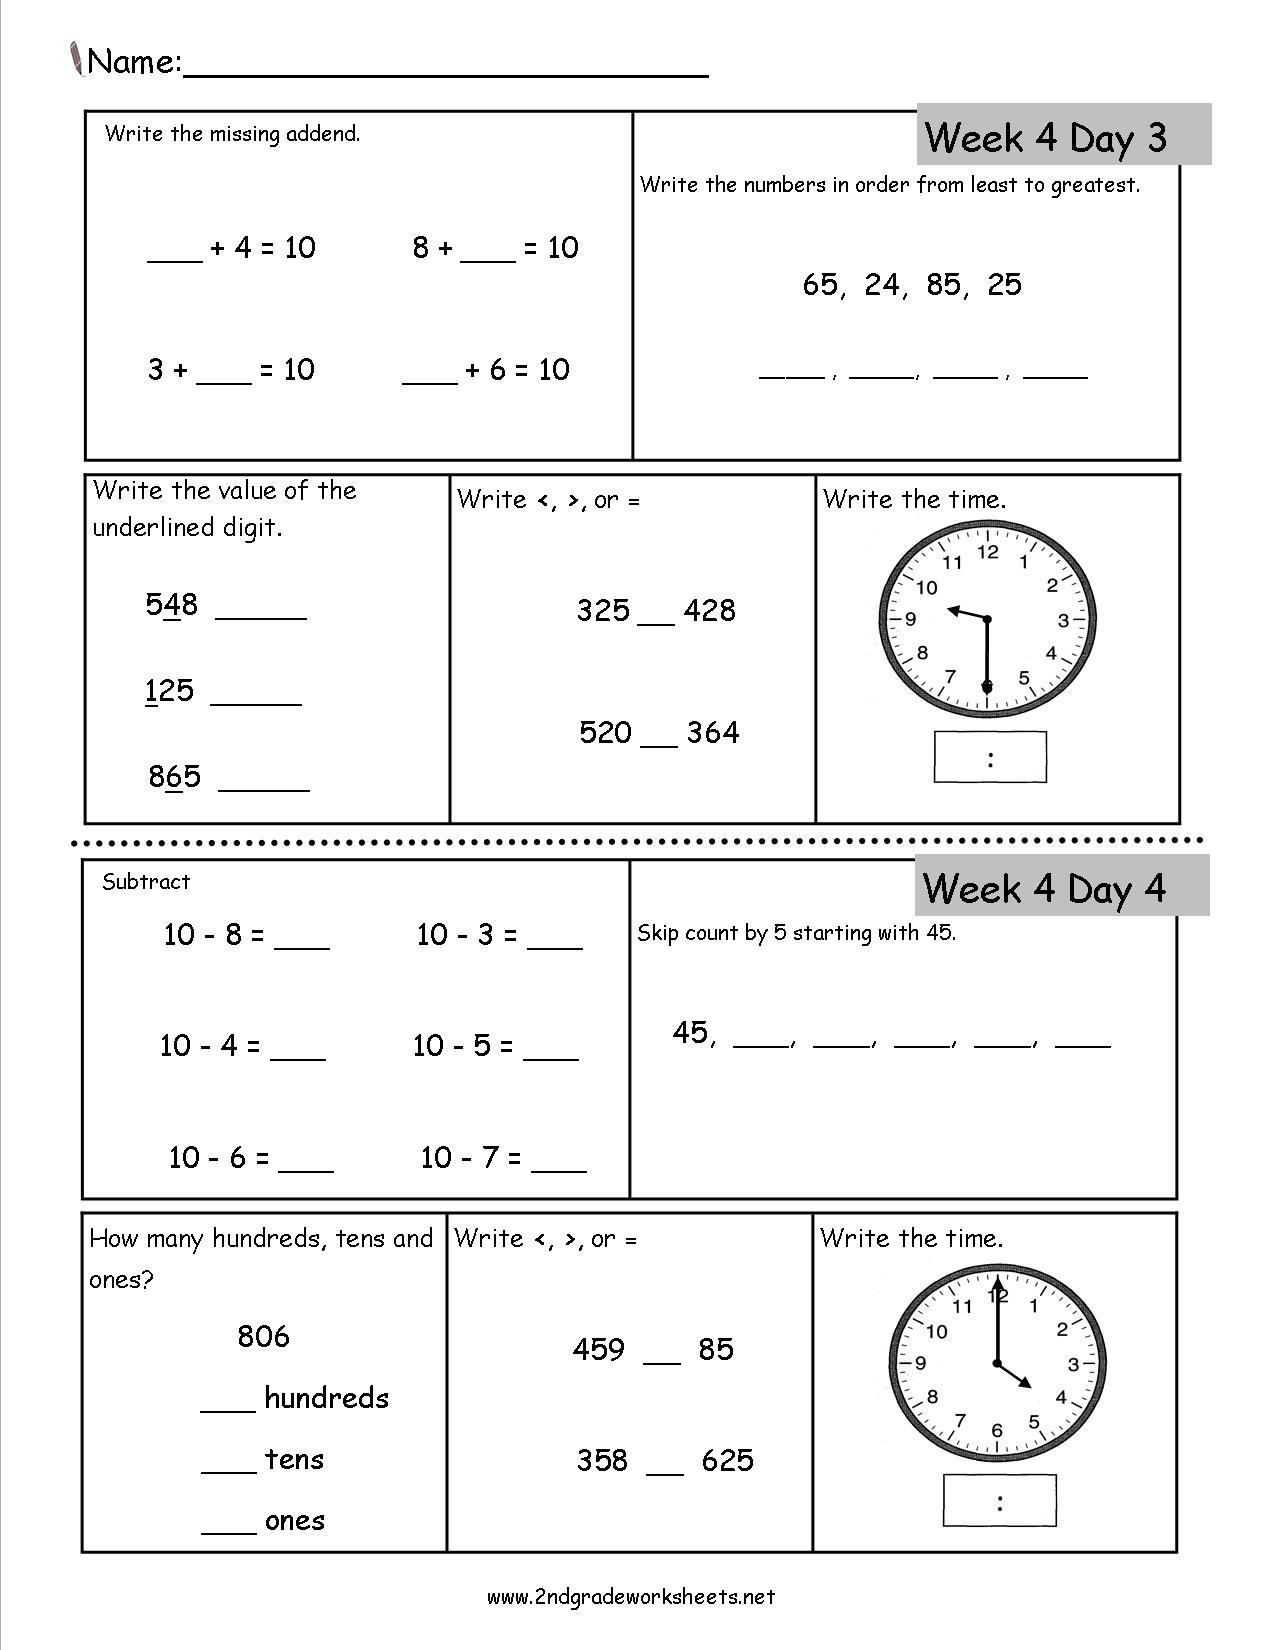 Blank Workout Routine Sheet